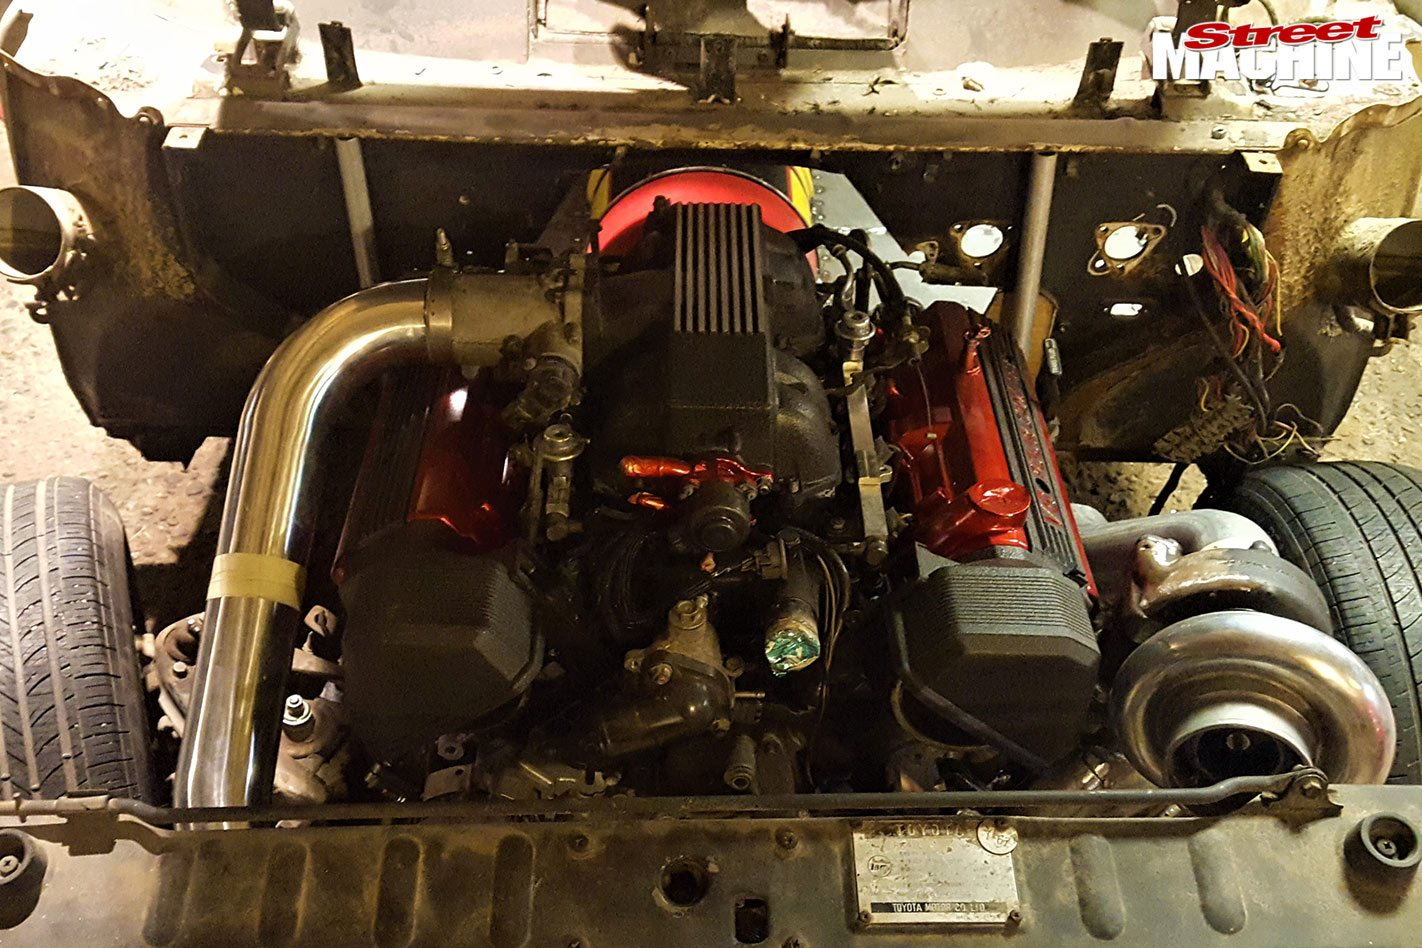 Toyota Stout project build